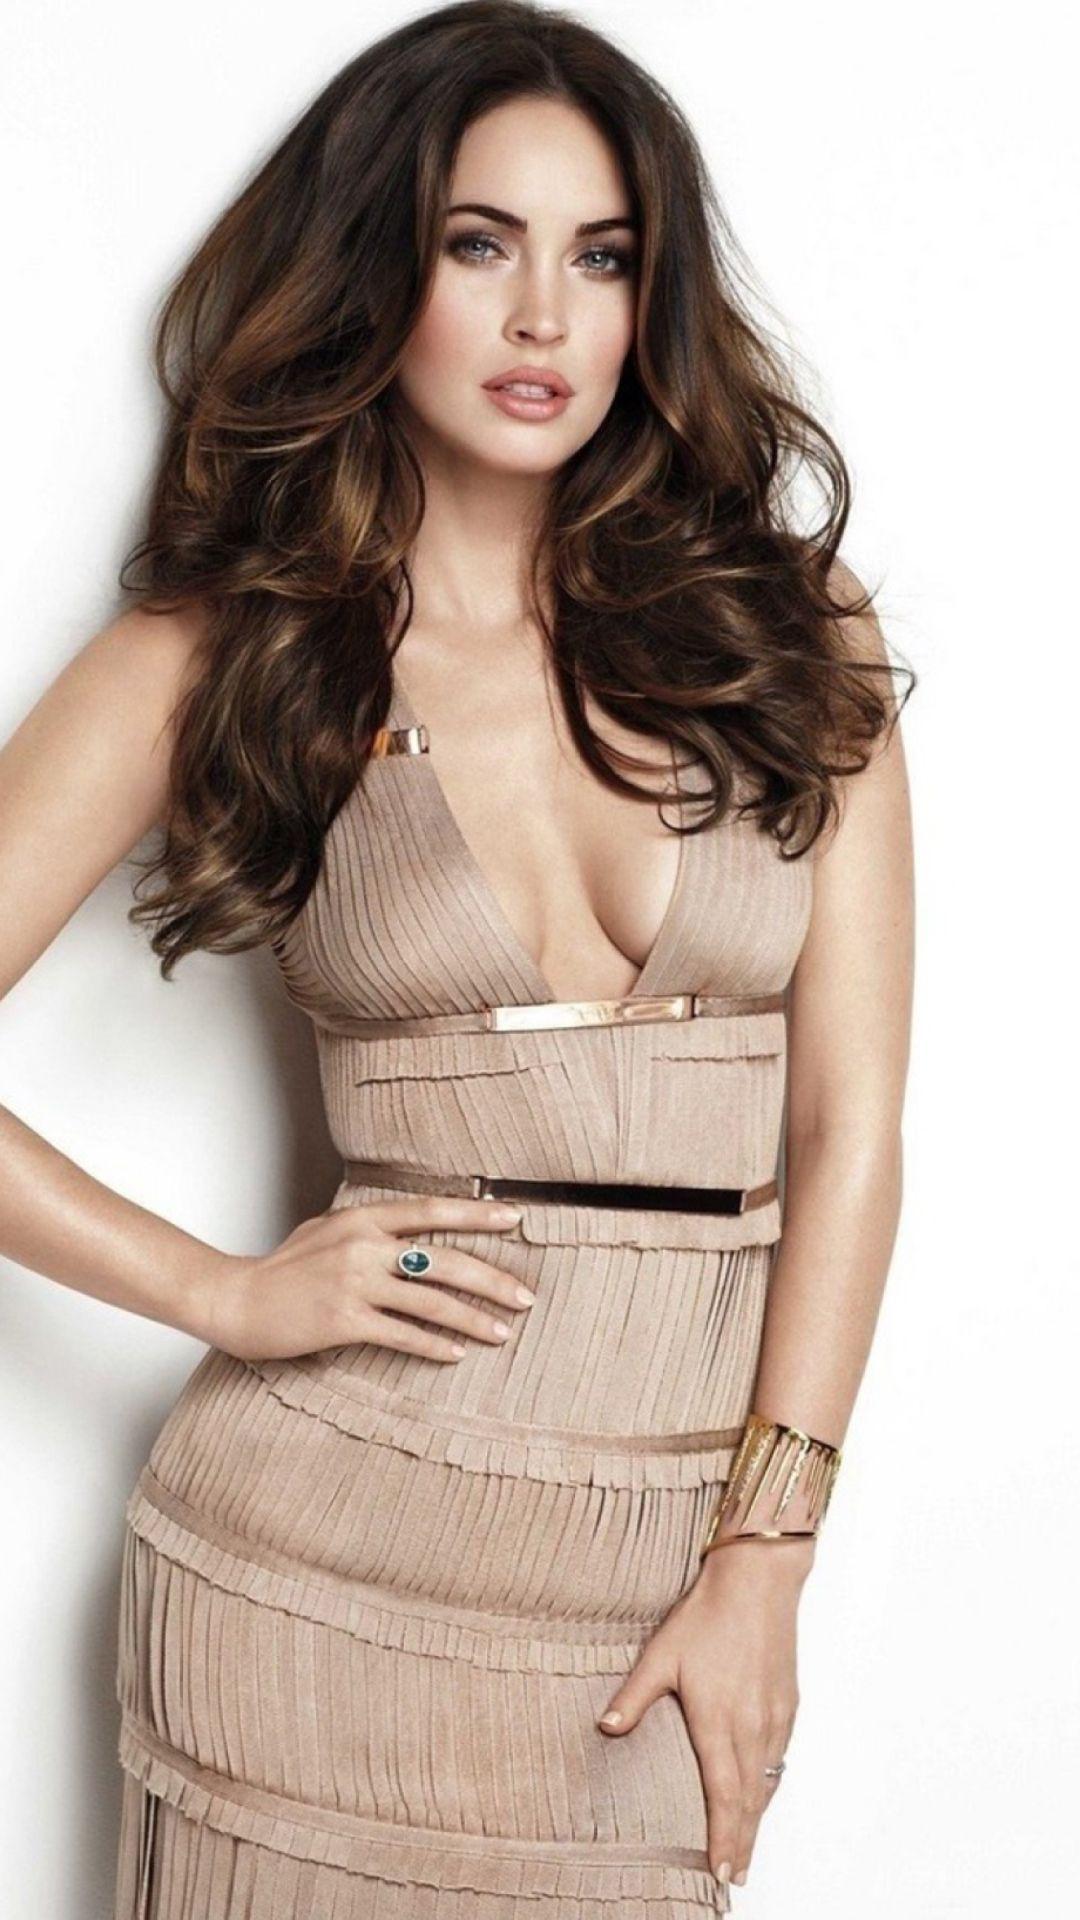 Megan Fox Hot Pictures Img Pic Celebrities